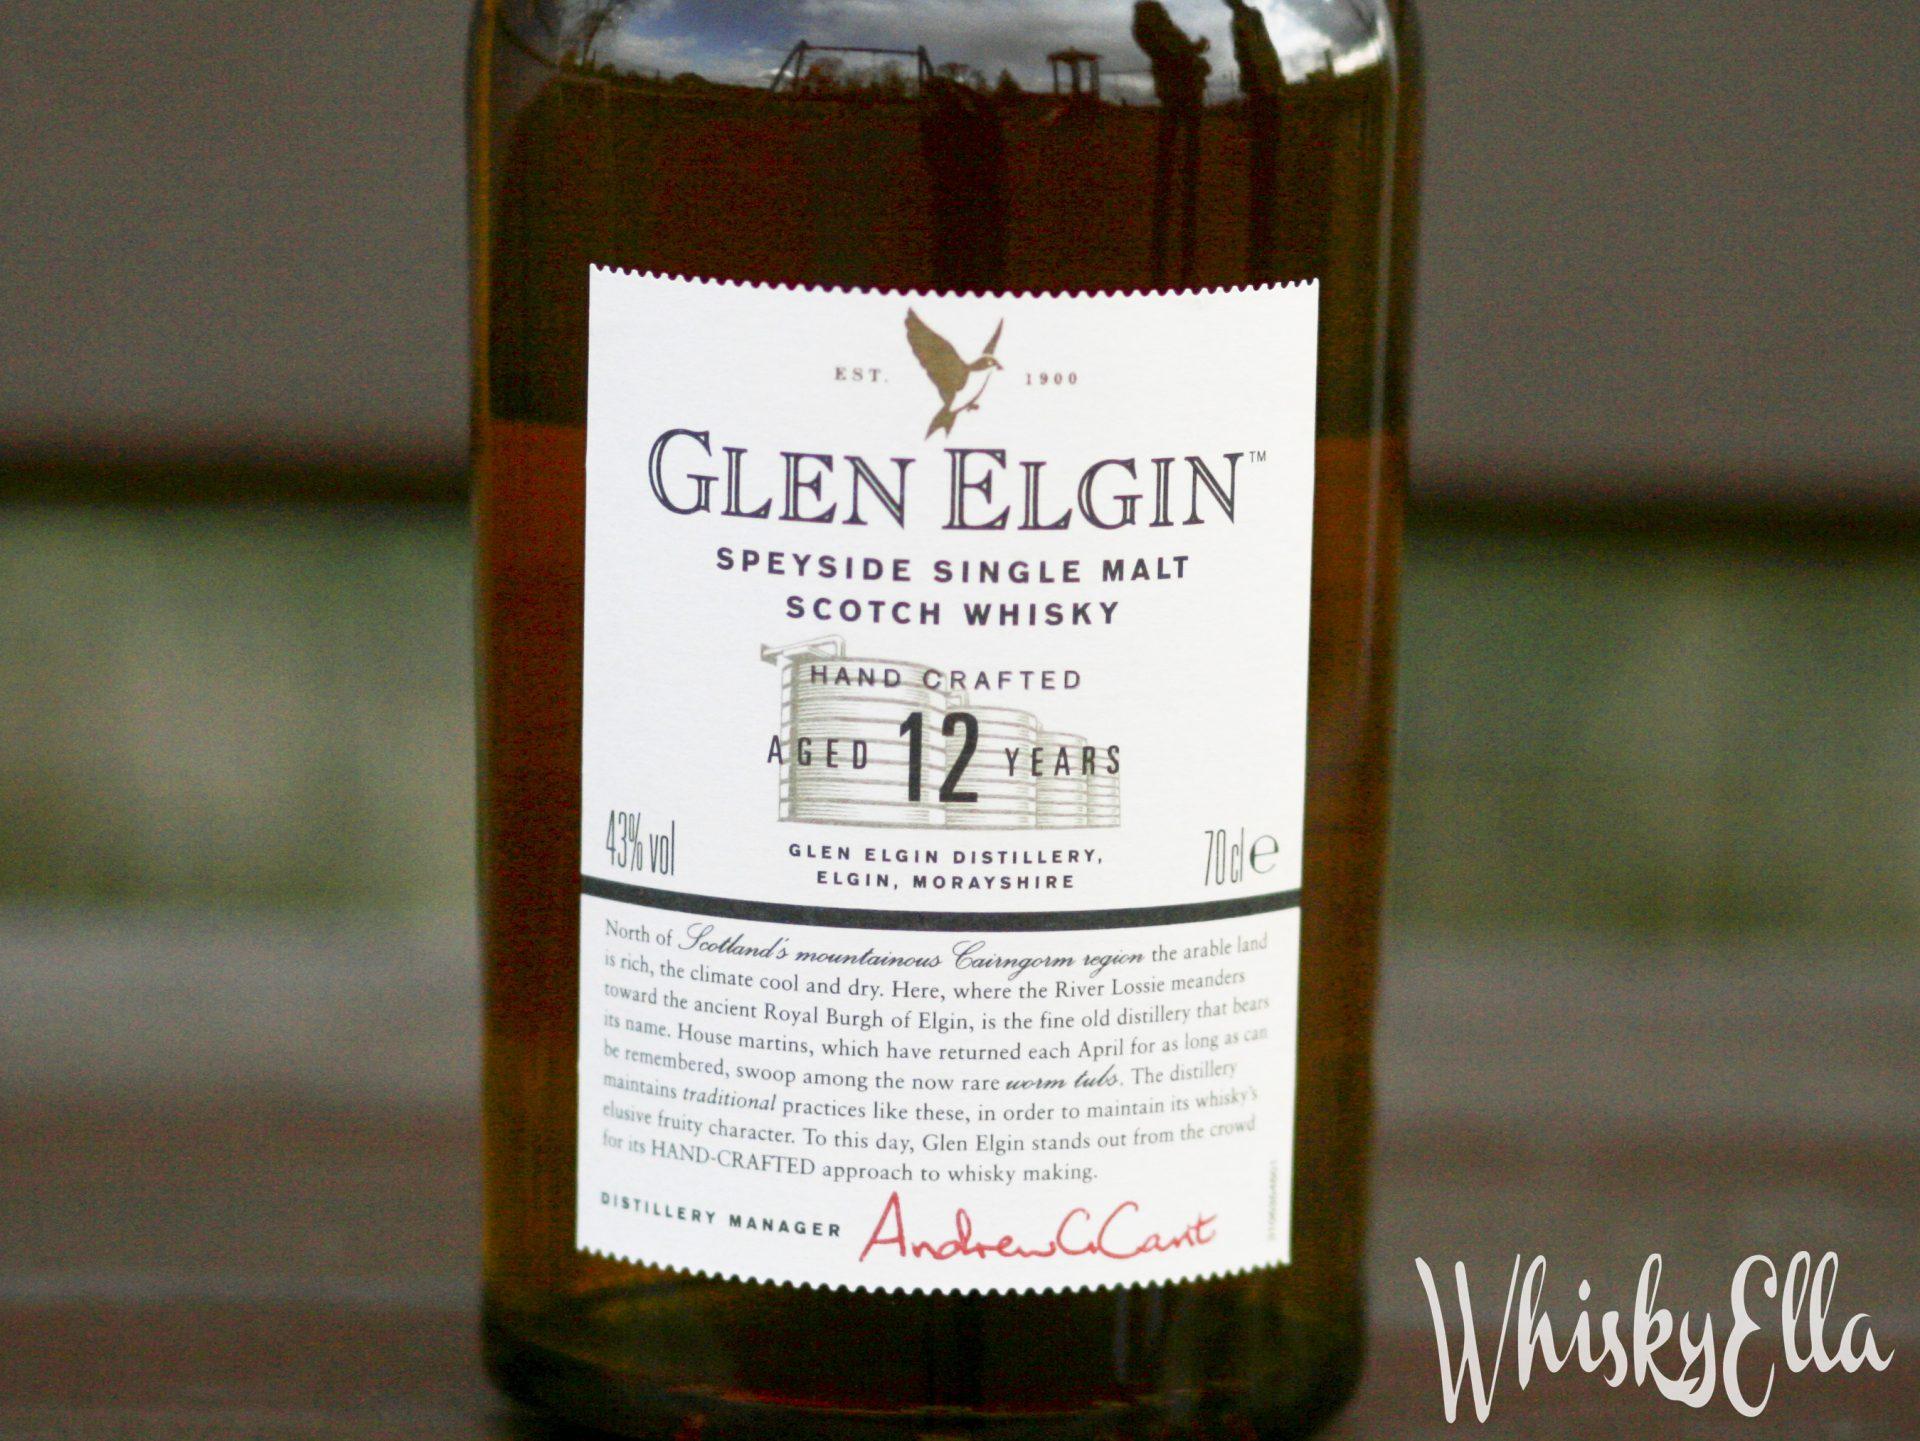 Nasza recenzja Glen Elgin 12 yo #105